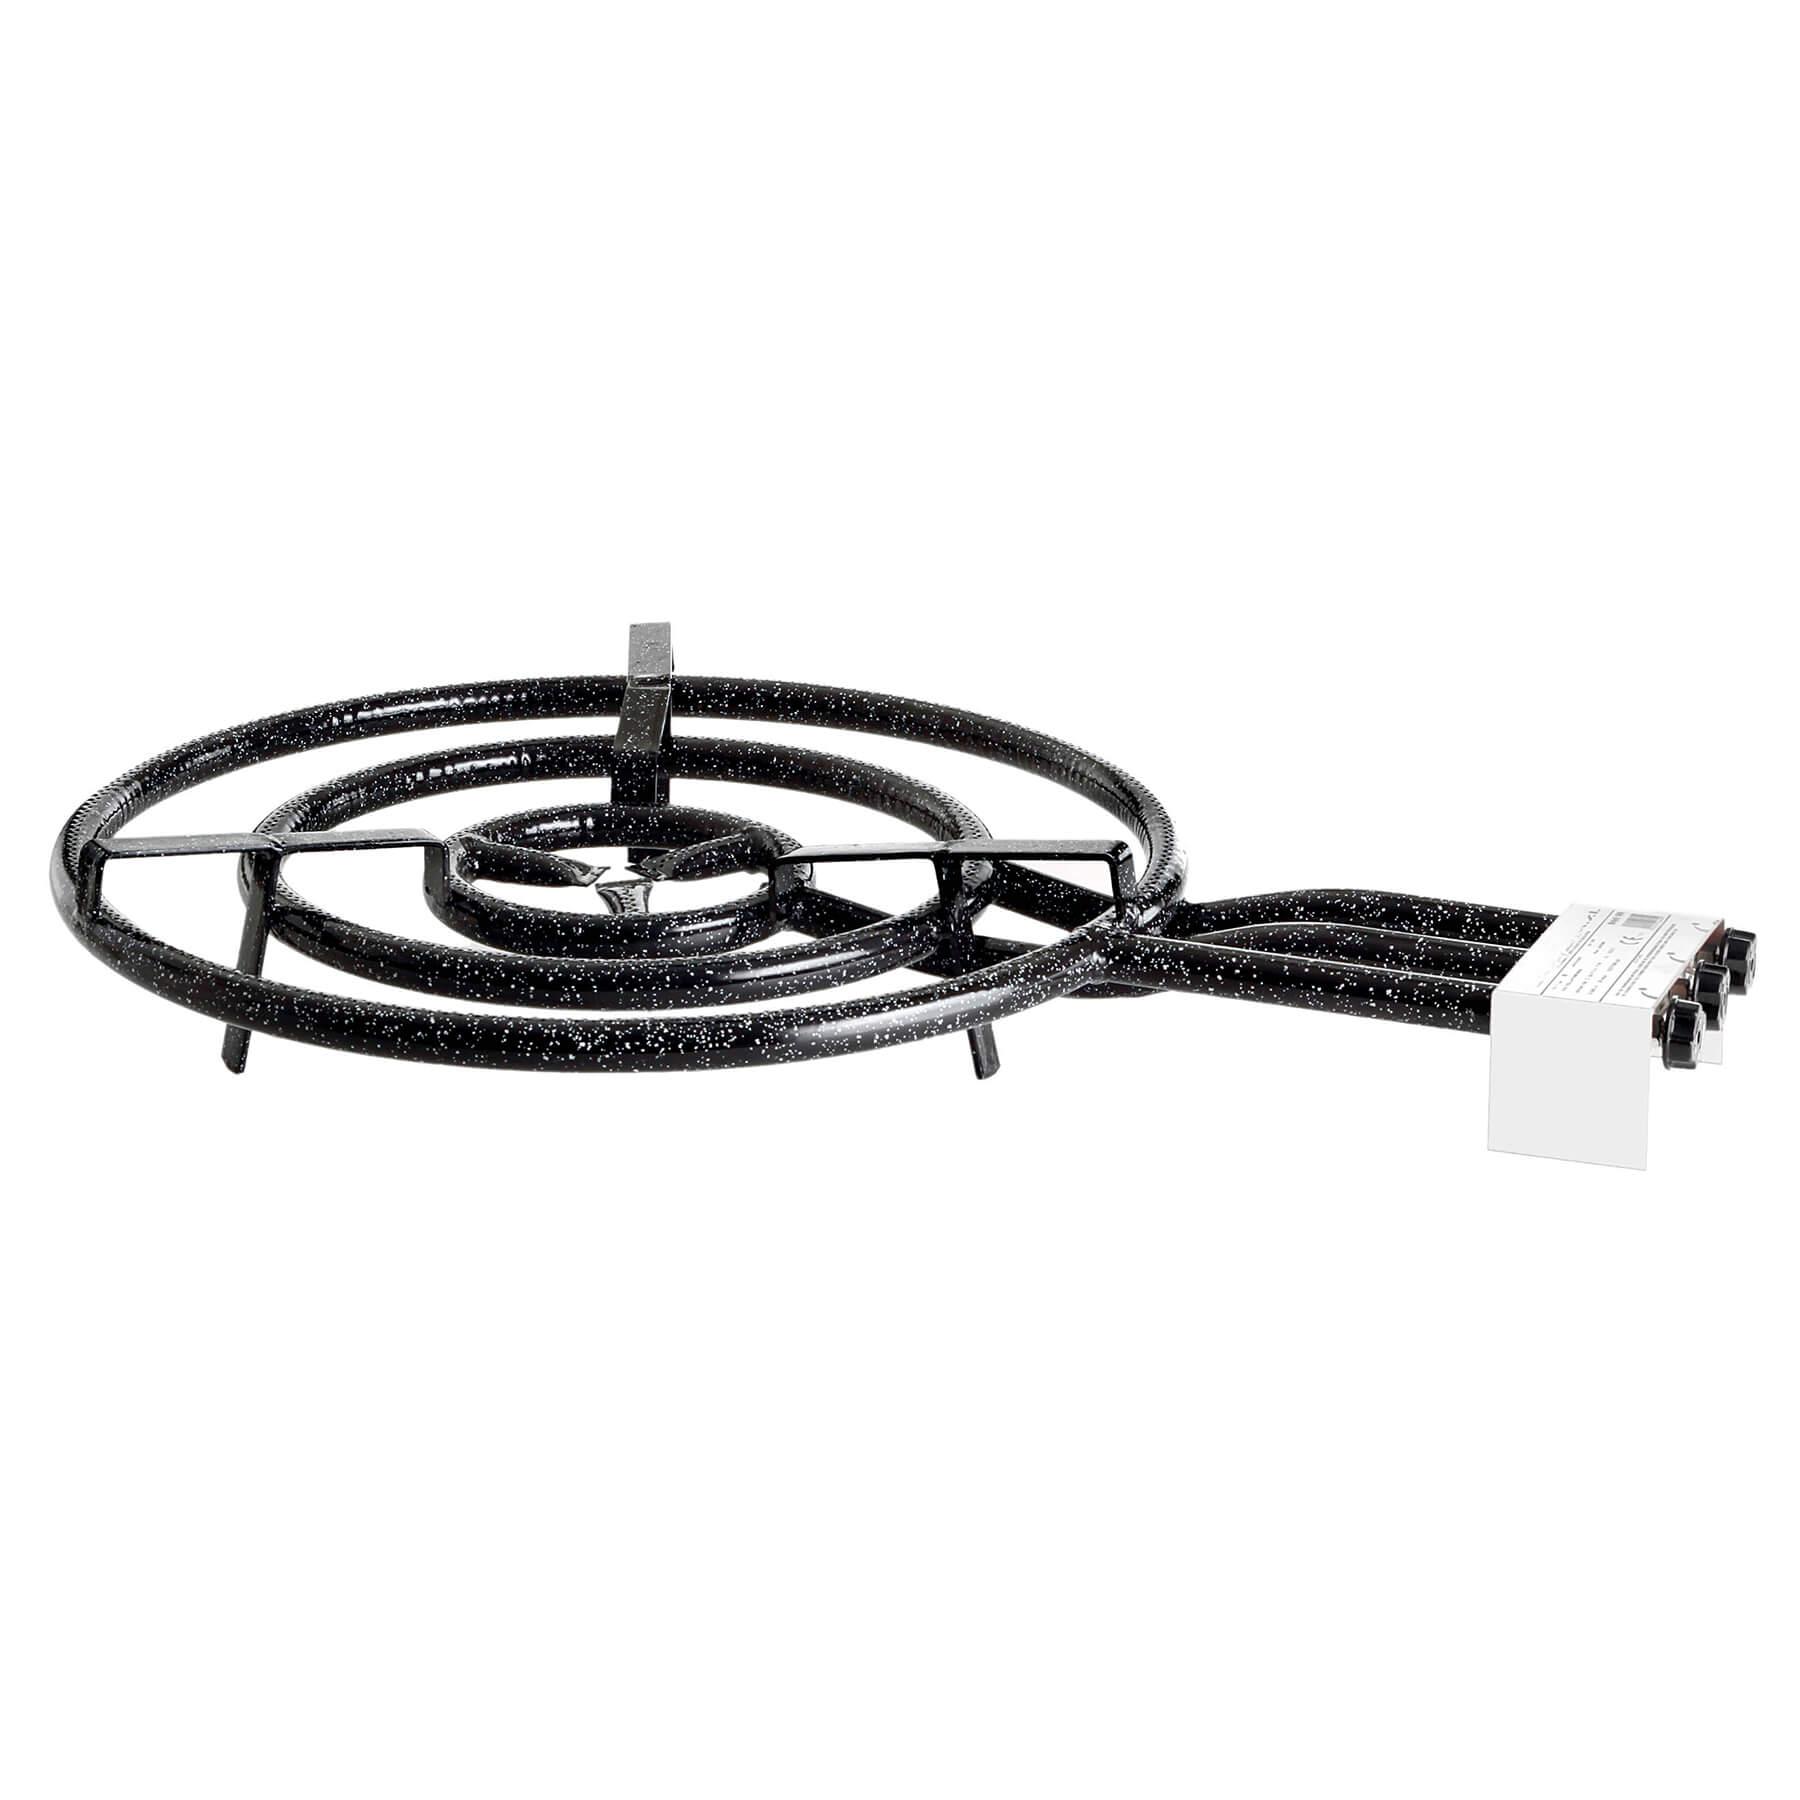 3-Ring-Gasbrenner, Ø 60 cm, 21,0 kW, 30 mbar Bild 1